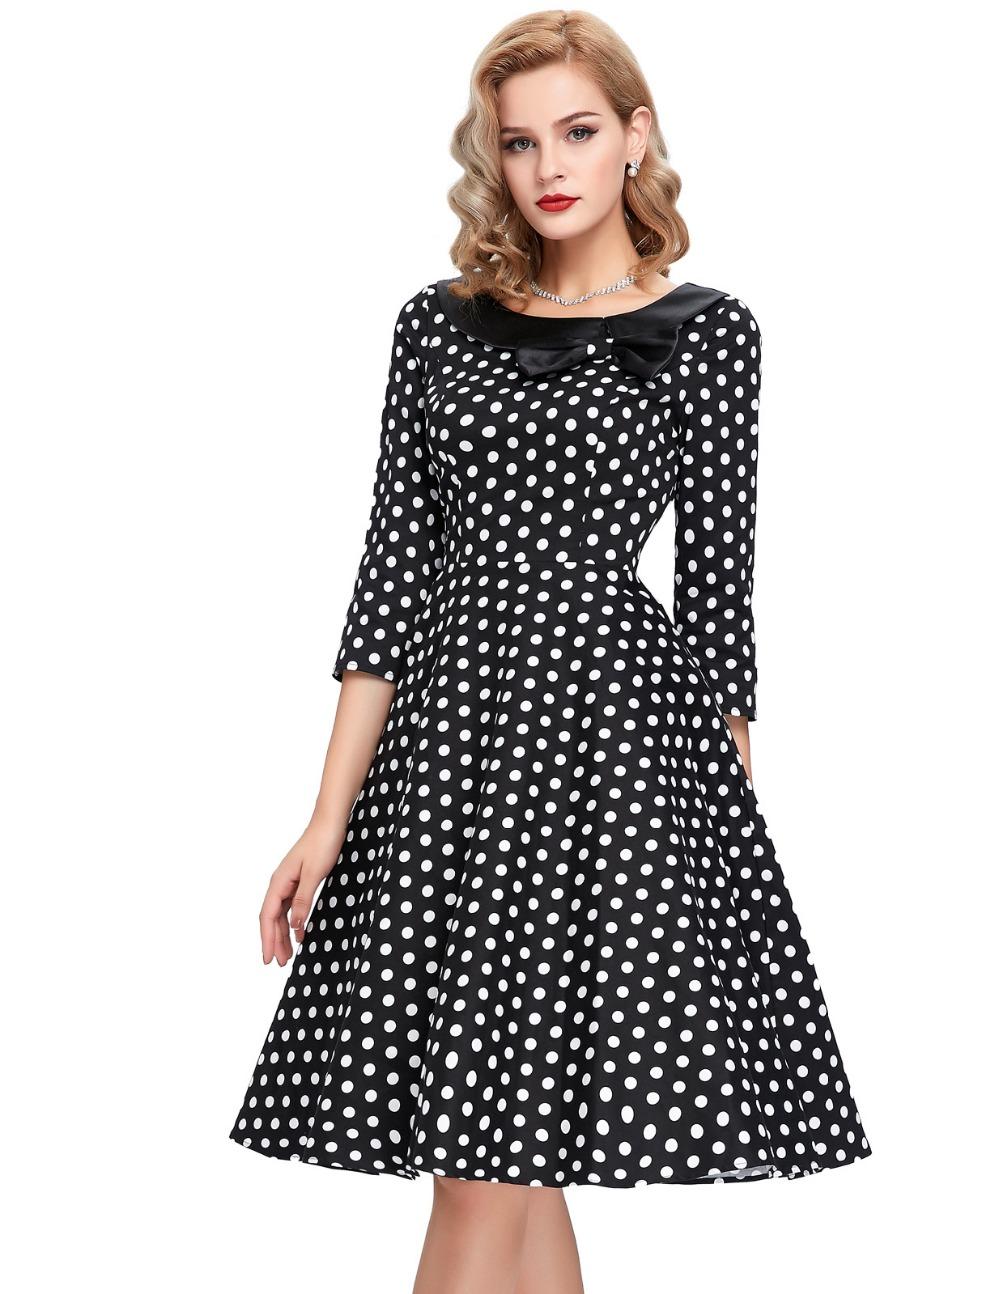 Buy vintage dress